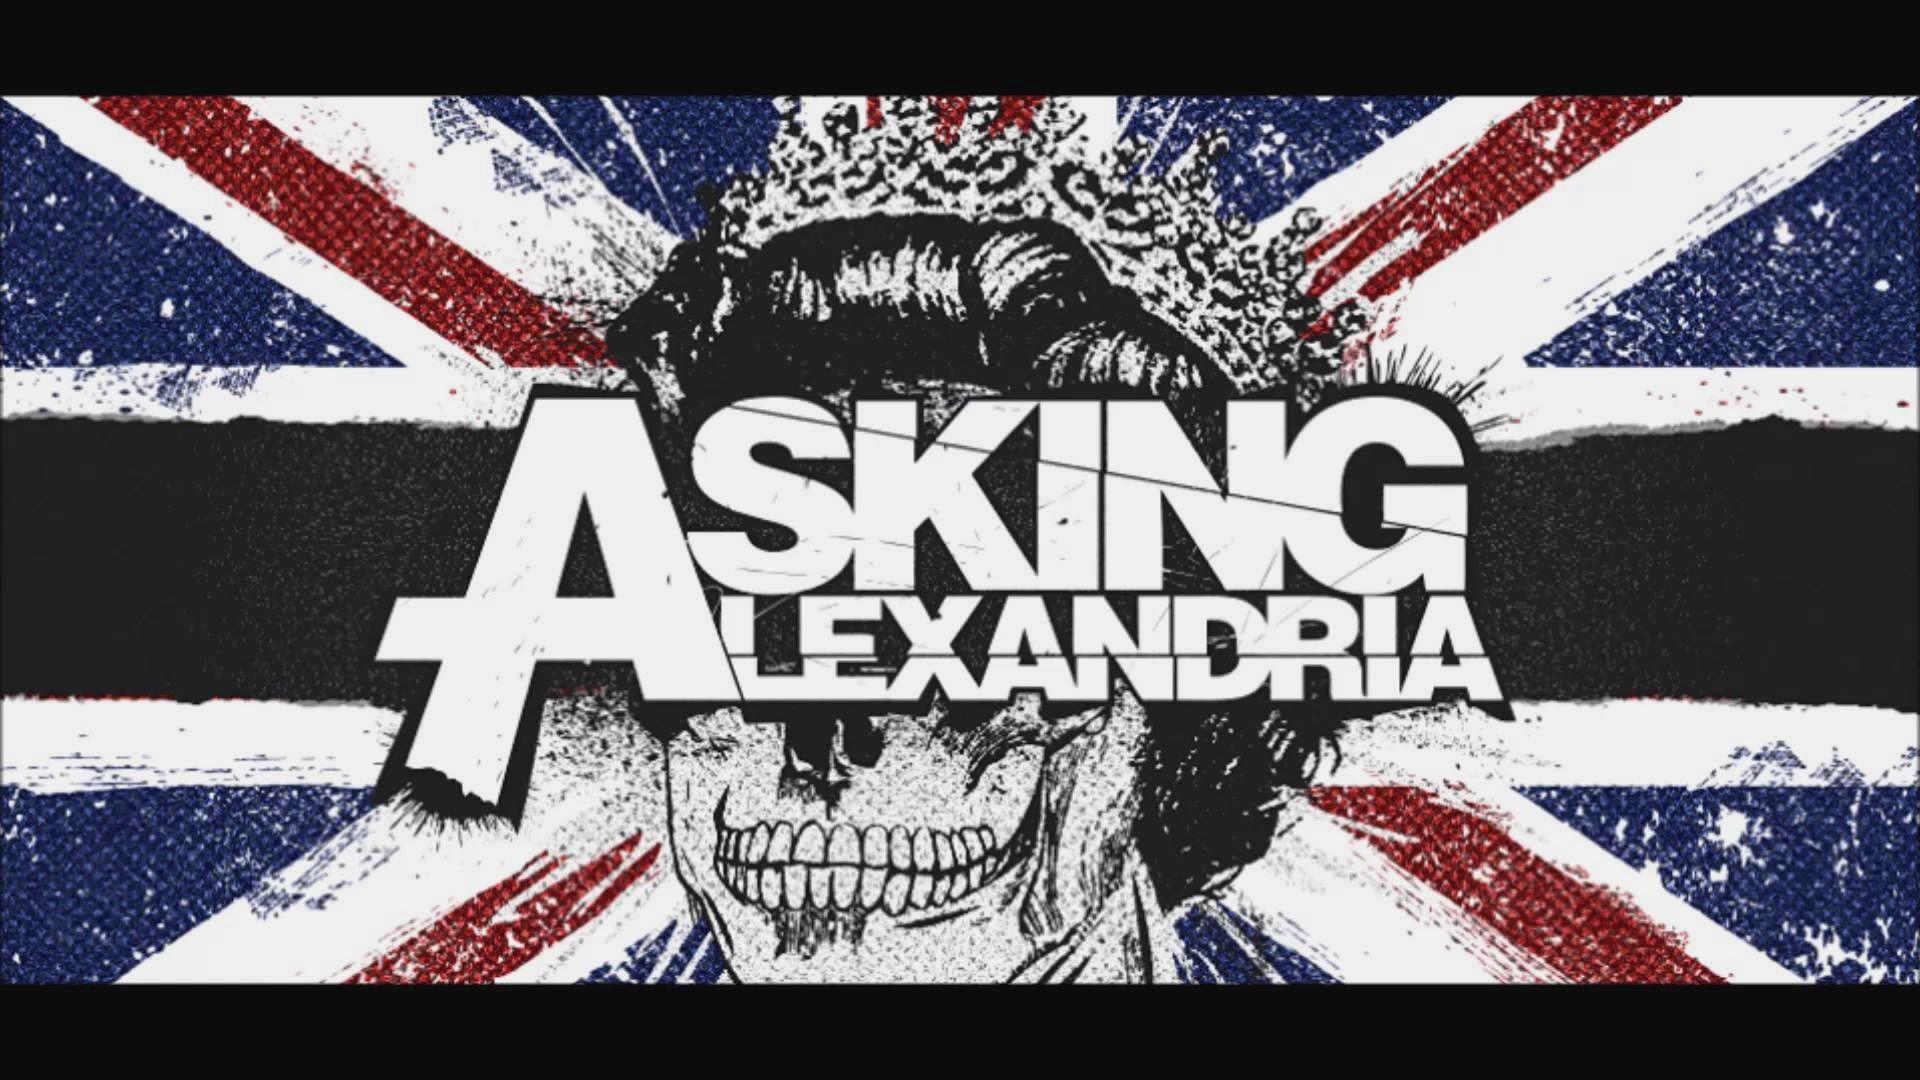 Preguntando Alexandria Fondos De Pantalla Hd Asking Alexandria Iphone Wallpaper Epic Asking Alexandria Lyrics